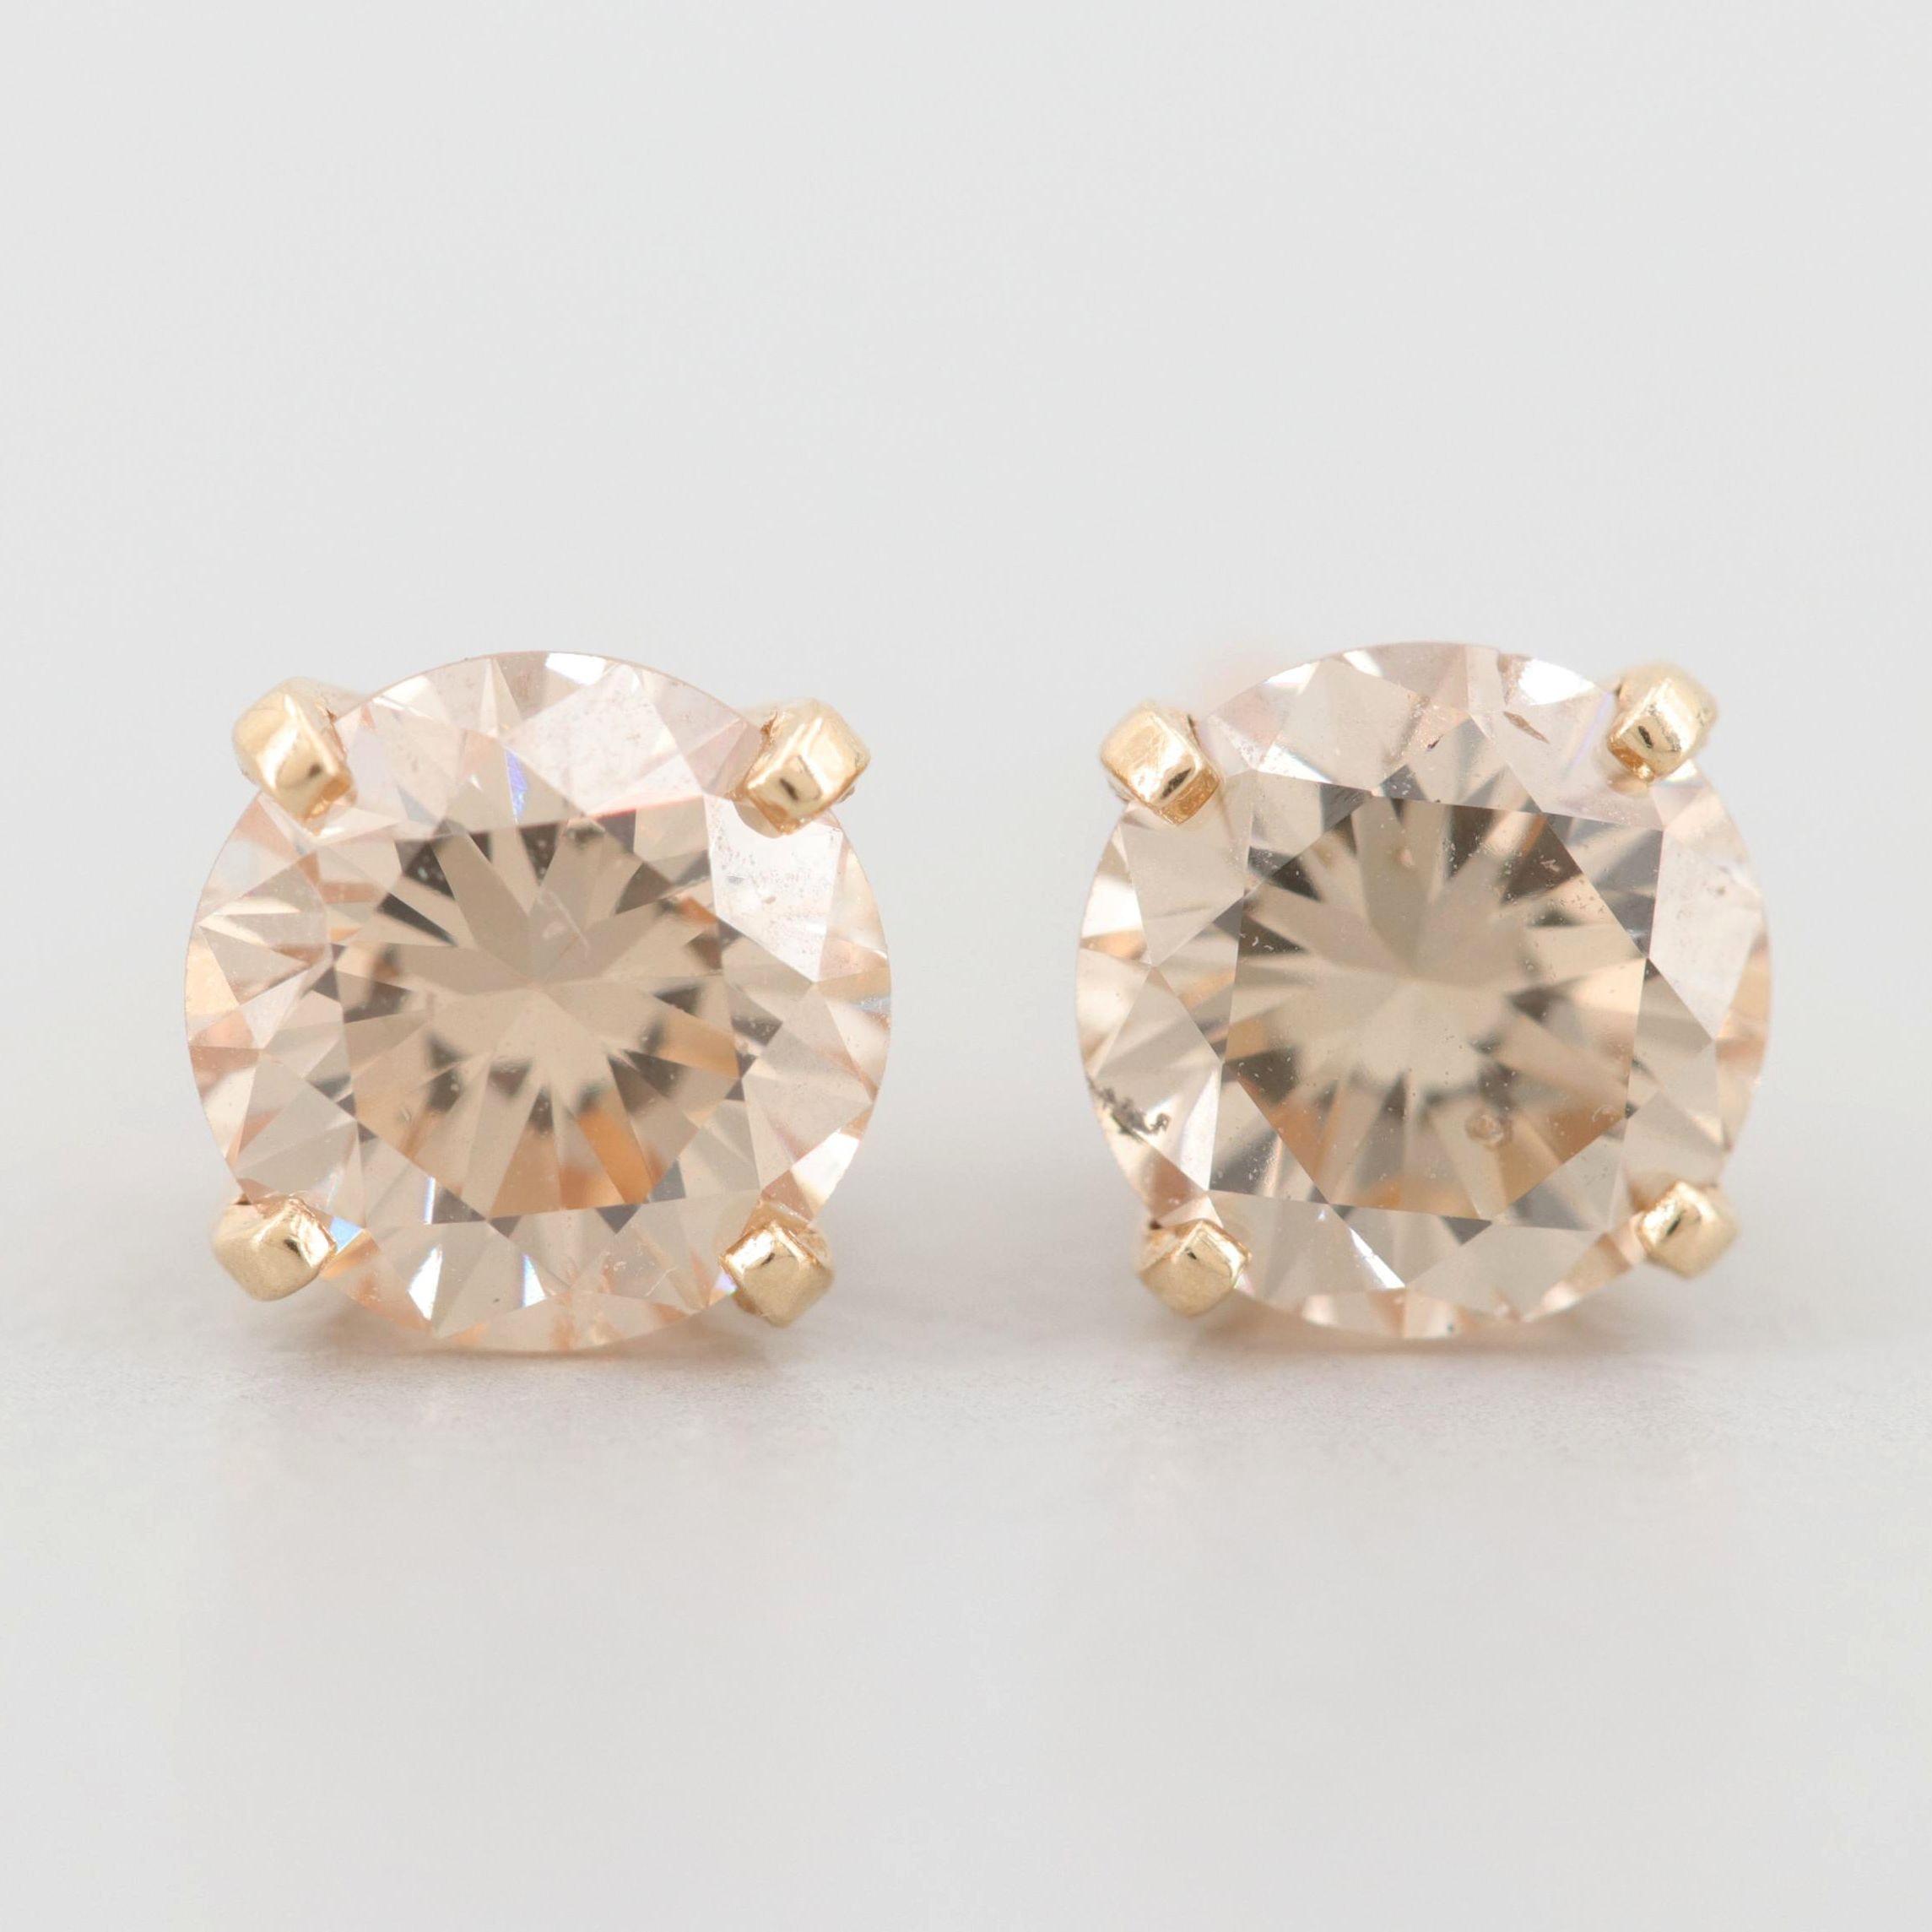 14K Yellow Gold 1.28 CTW Diamond Stud Earrings